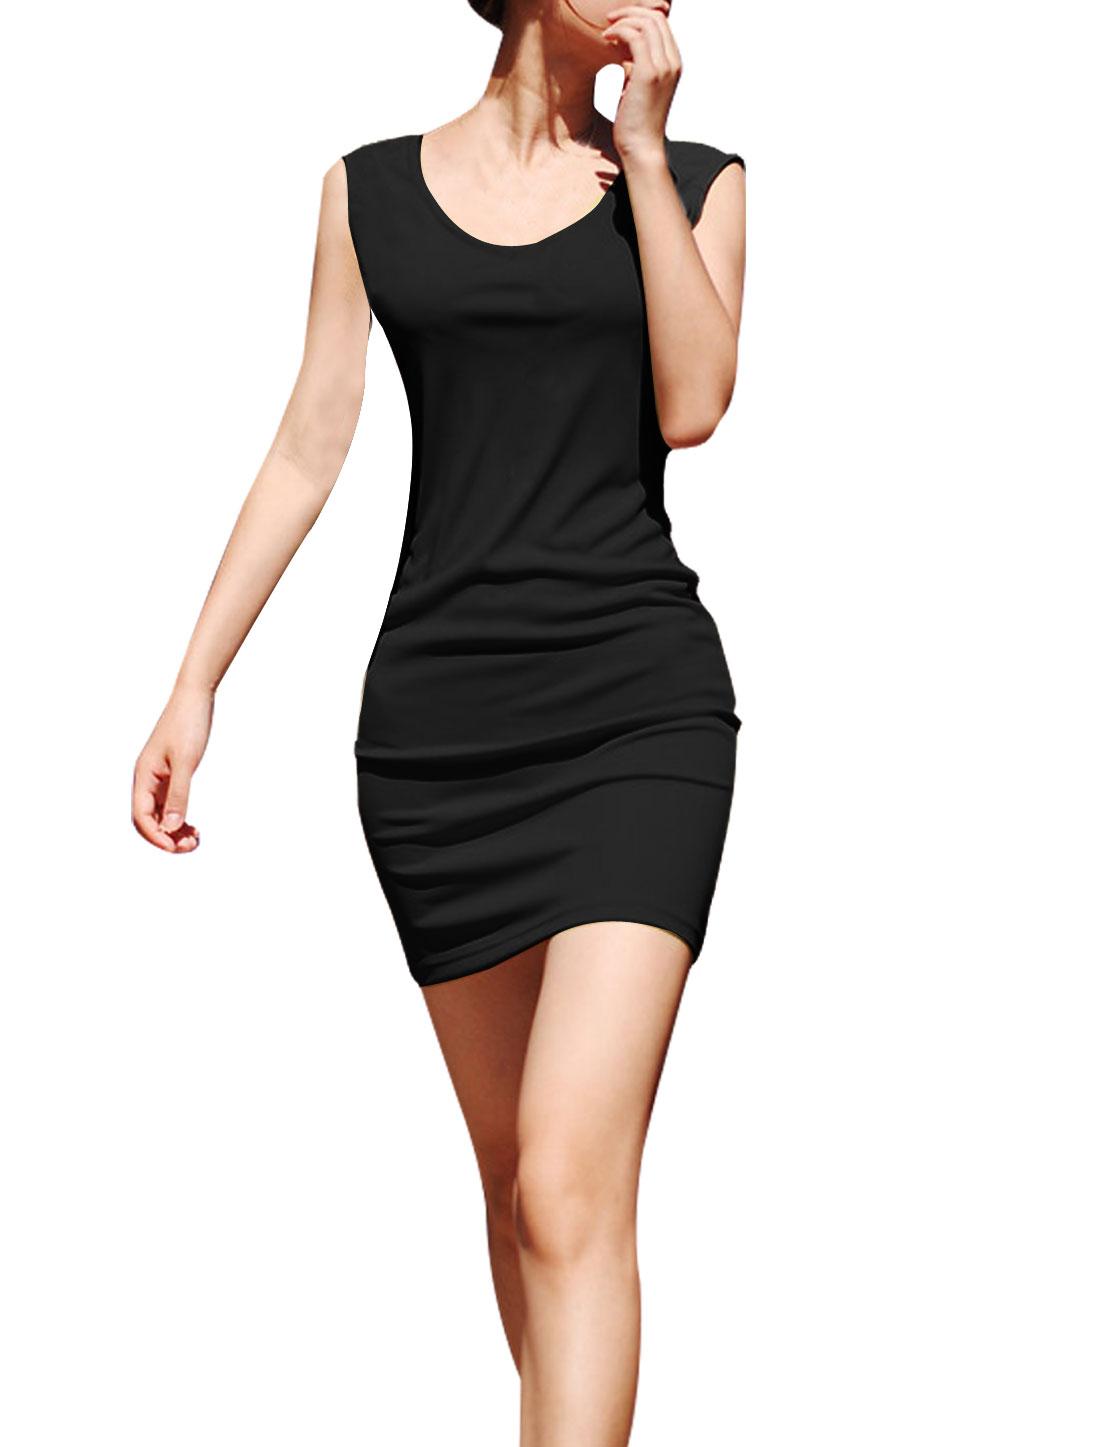 Fashion Ladies V-Neck Sleeveless Slim Fit Black Mini Dress XL